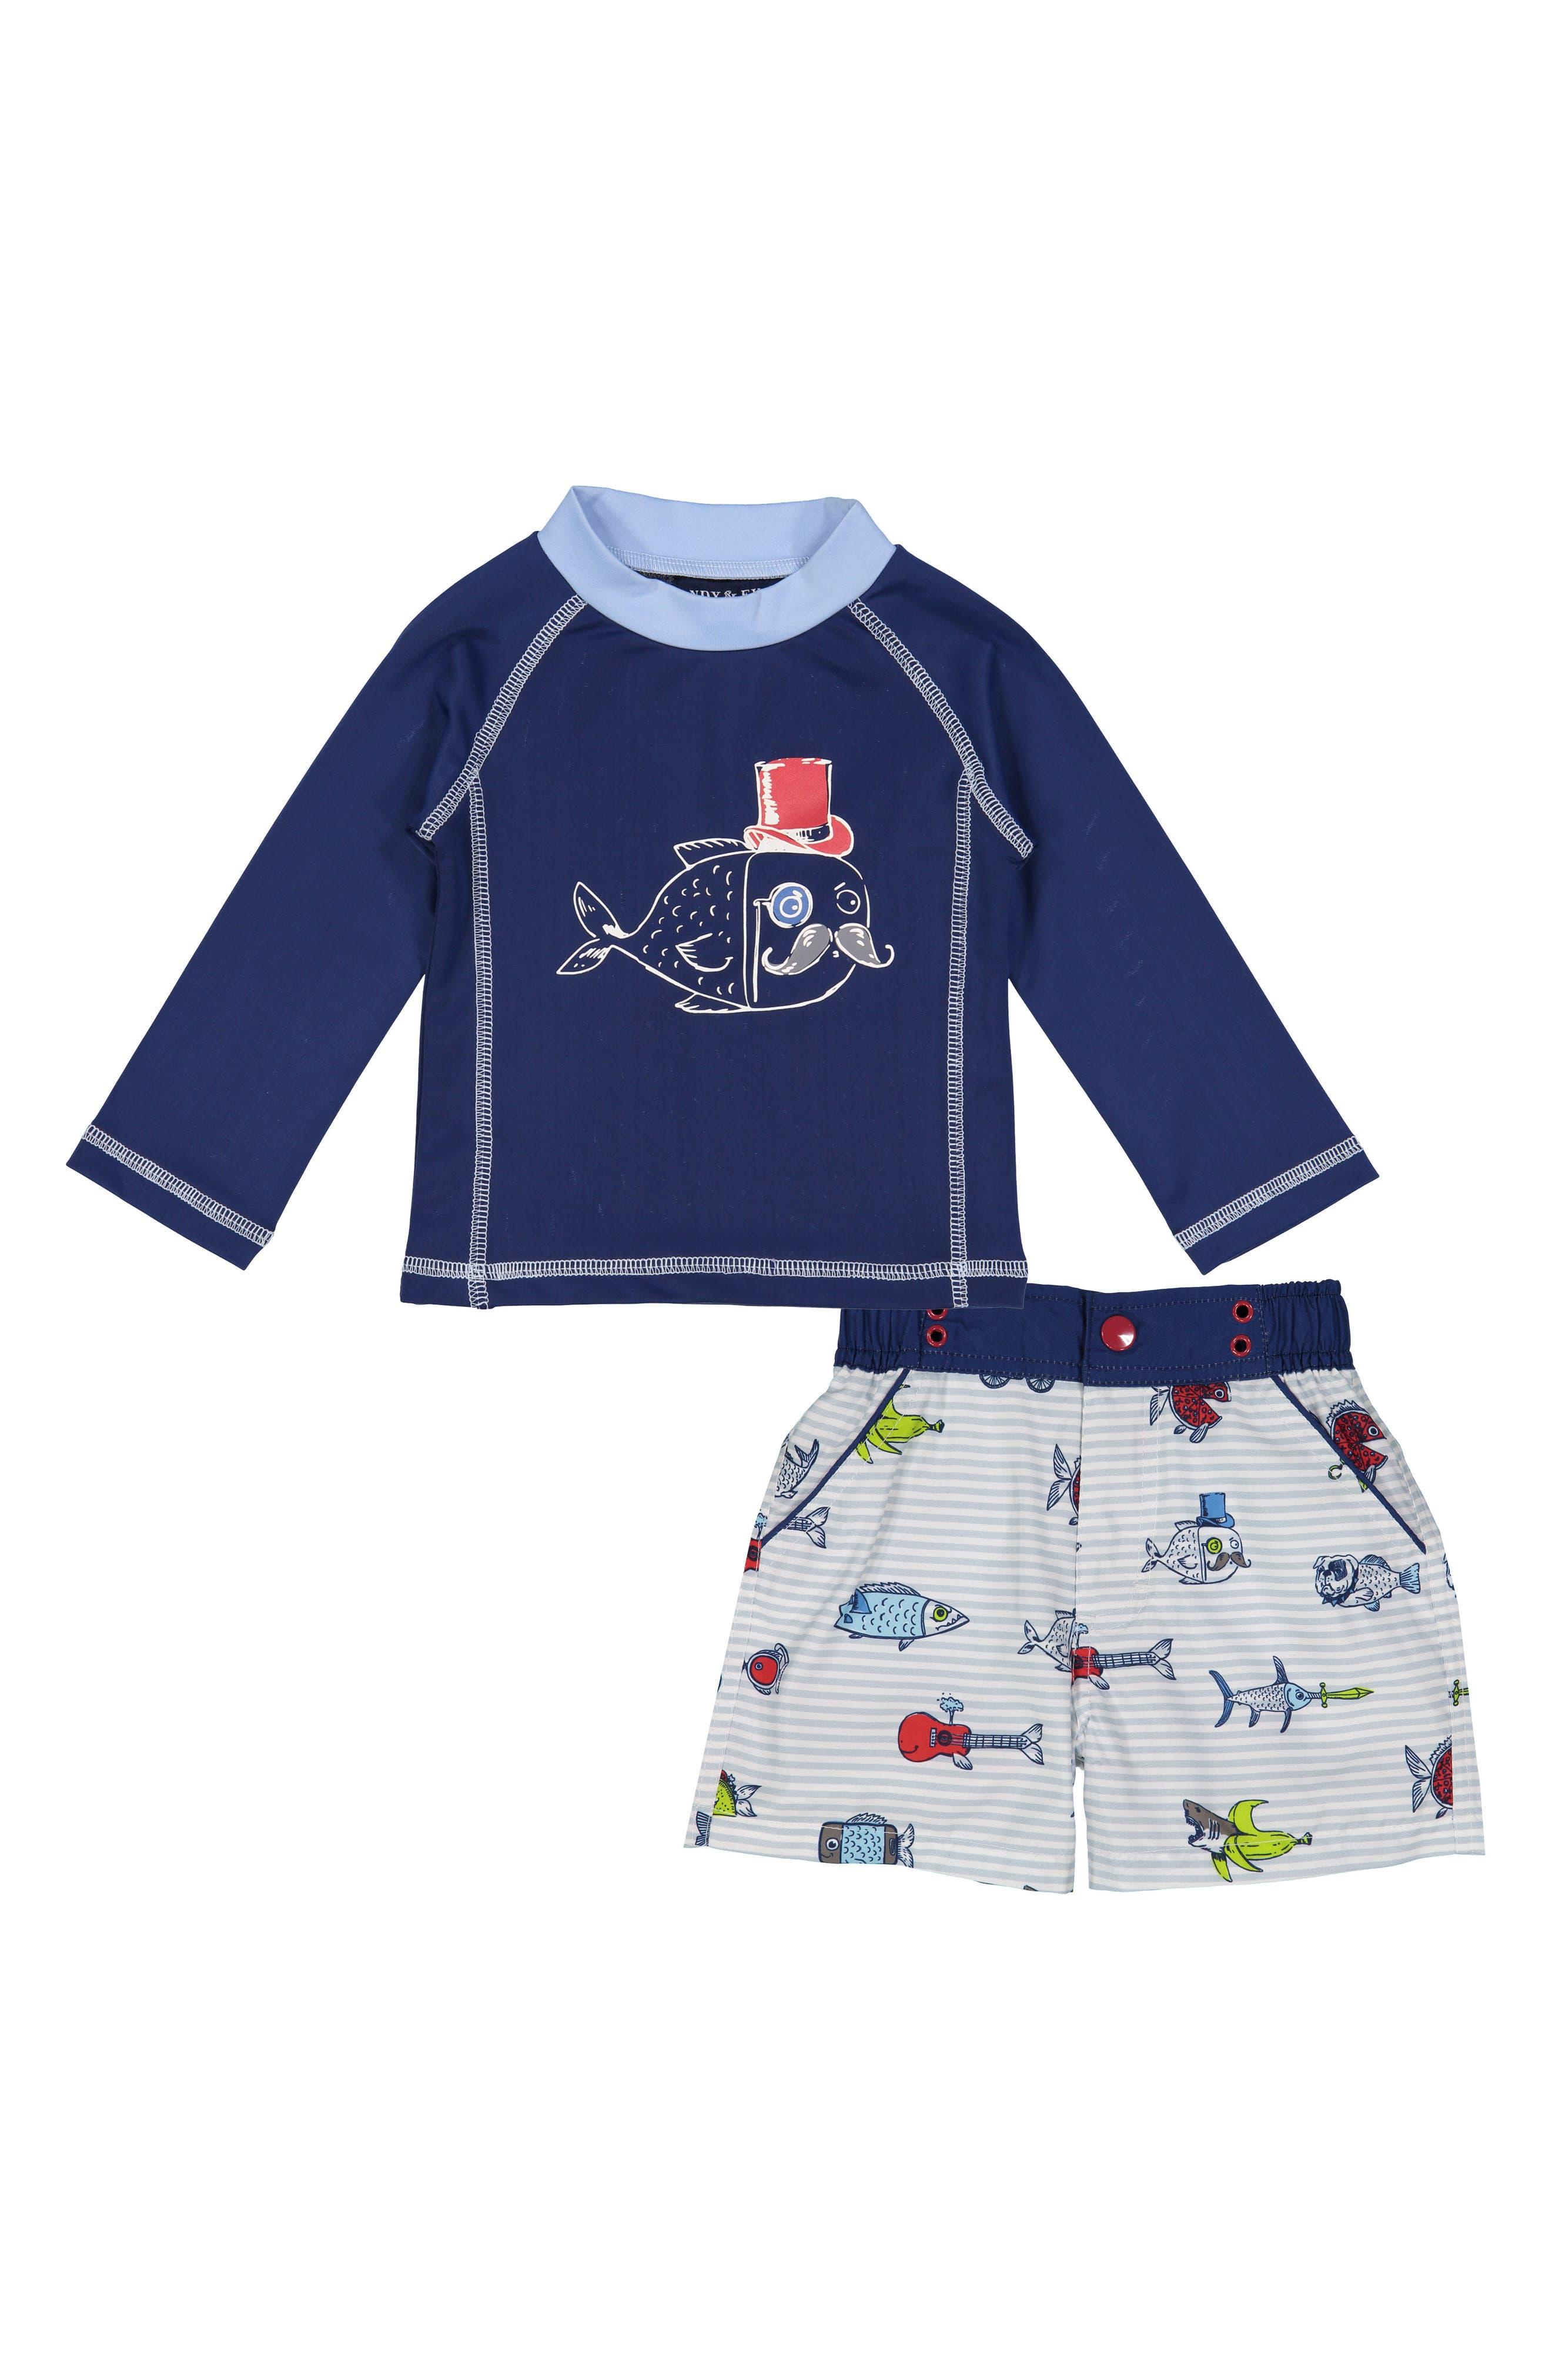 Main Image - Andy & Evan Fish Two-Piece Rashguard Swimsuit (Baby Boys)